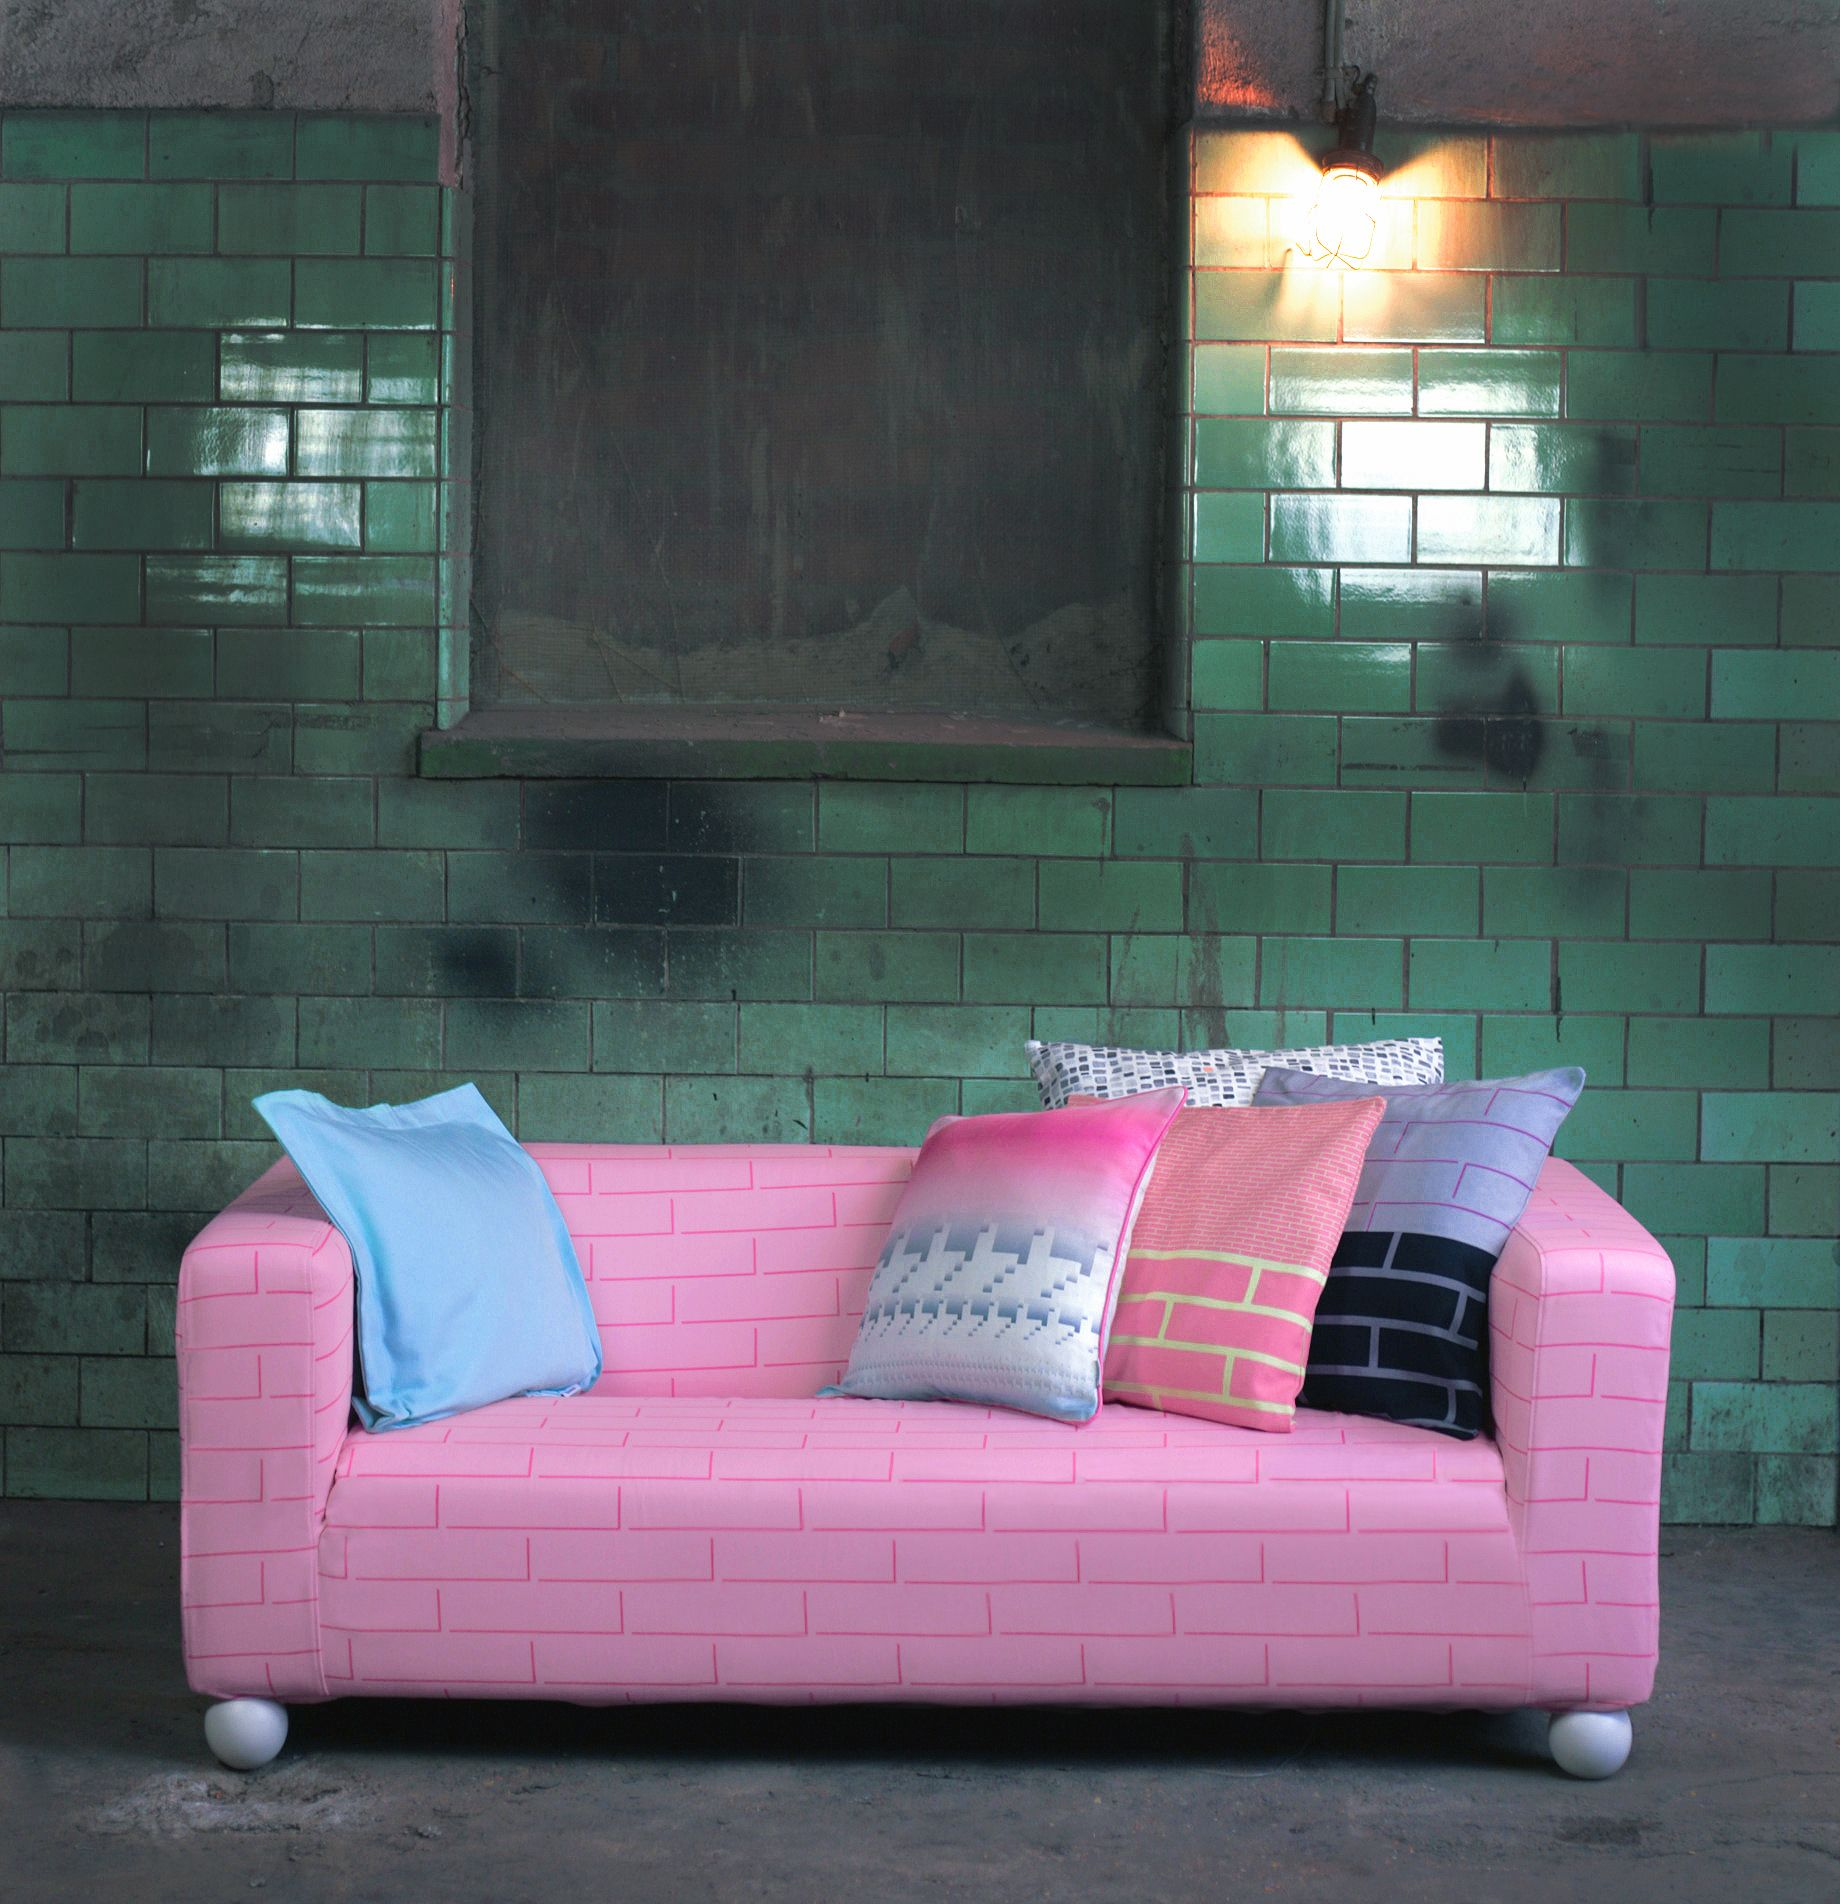 Bemz cover for Klippan 2 seater sofa fabric Brick Building Pink